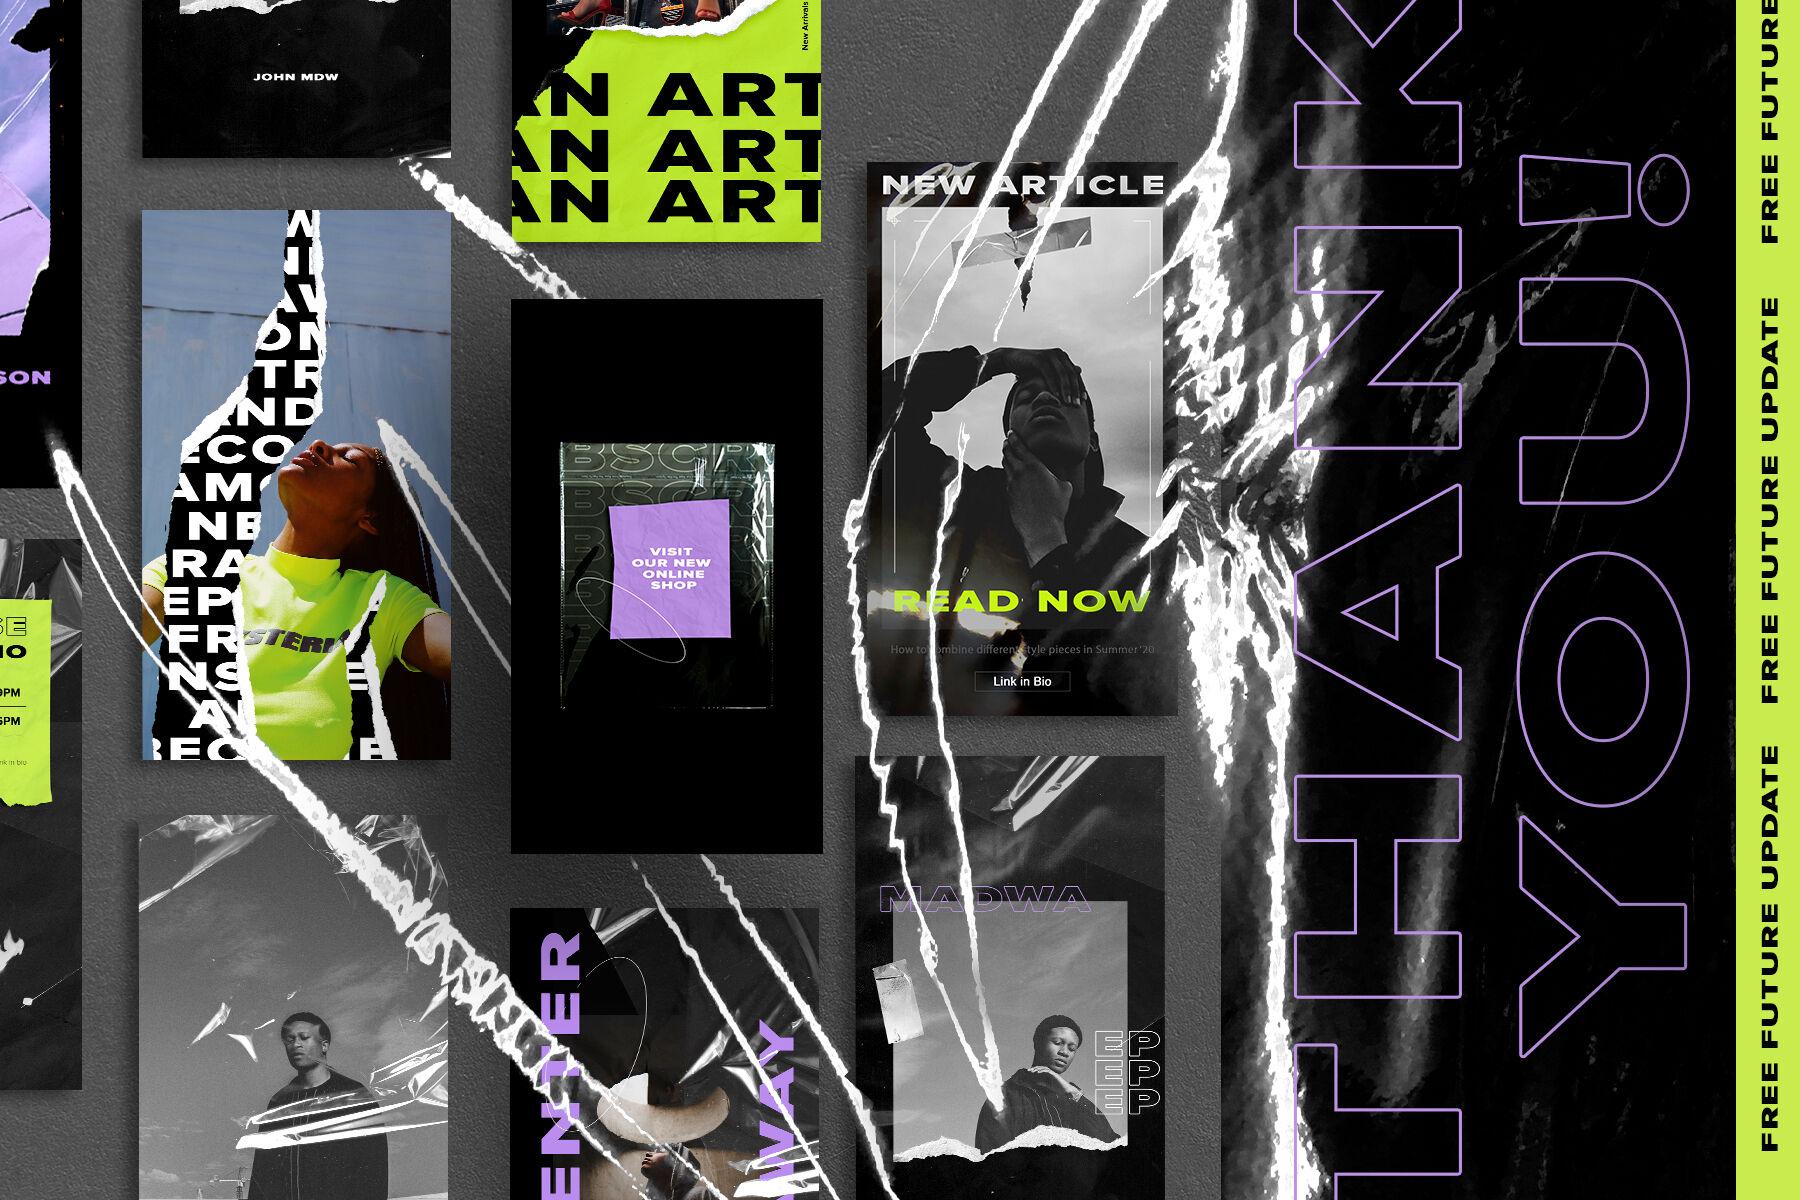 Acid Bold Trend Neon Instagram Templates By Storiesnoworries